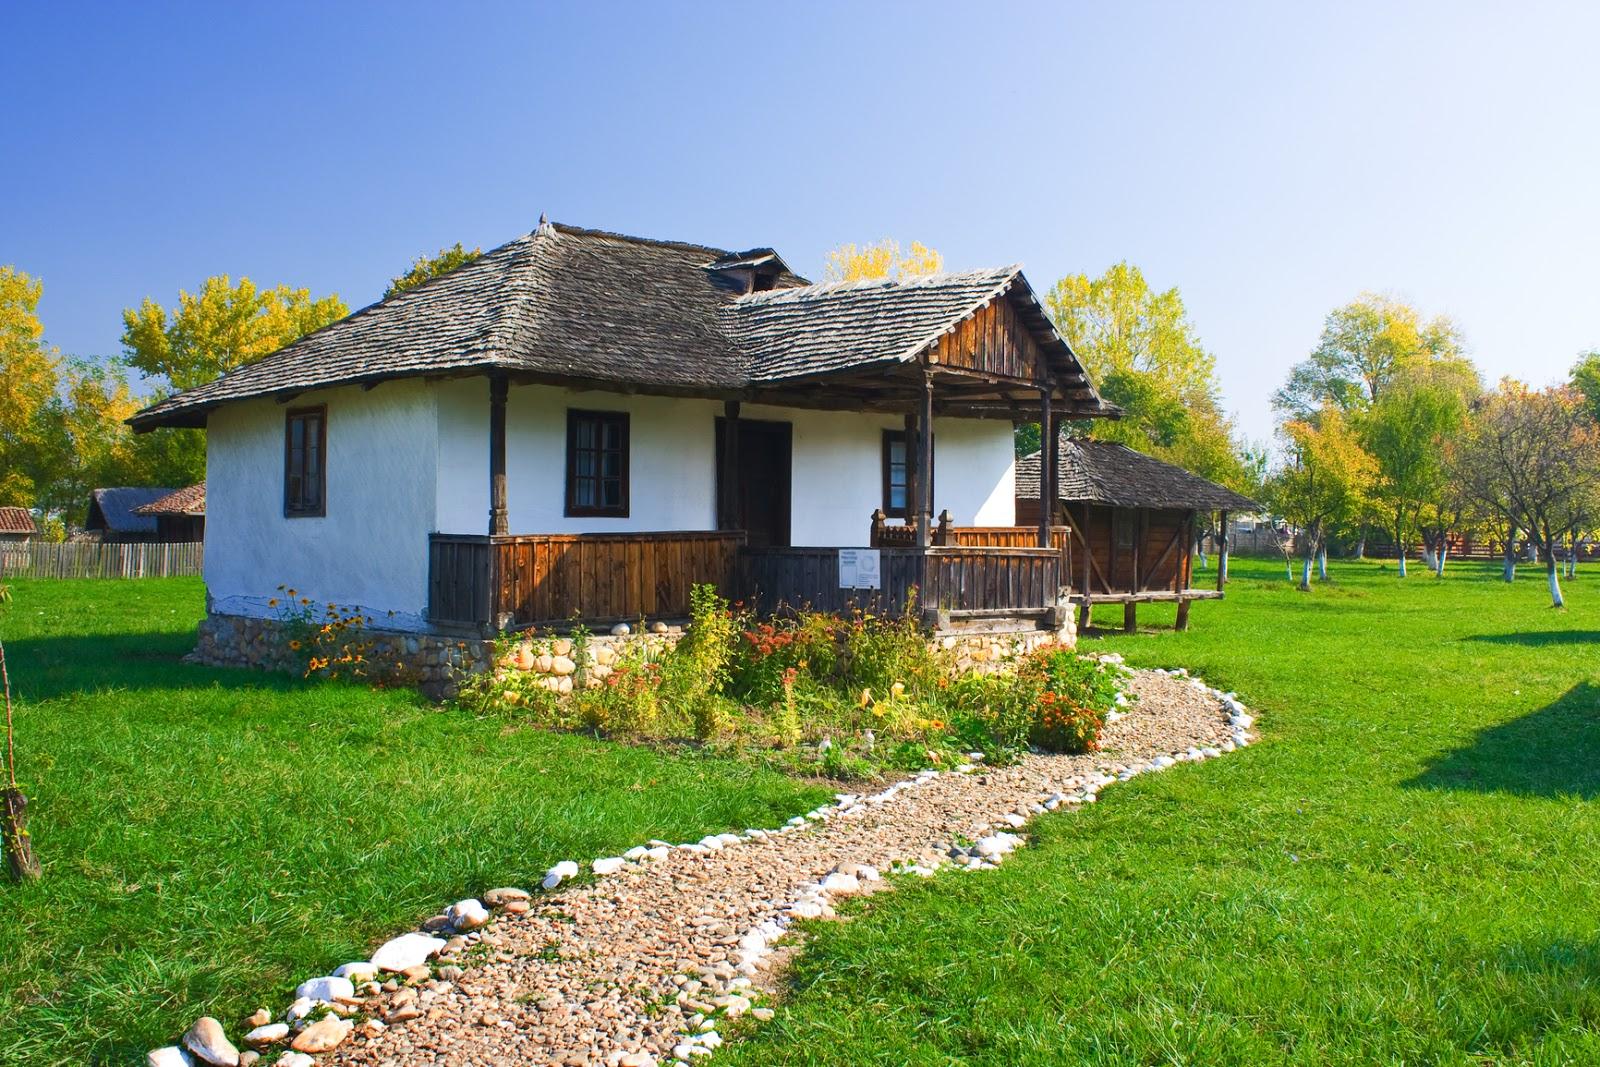 Im gene experience 20 fotos recientes de paisajes - Paisajes de casas ...